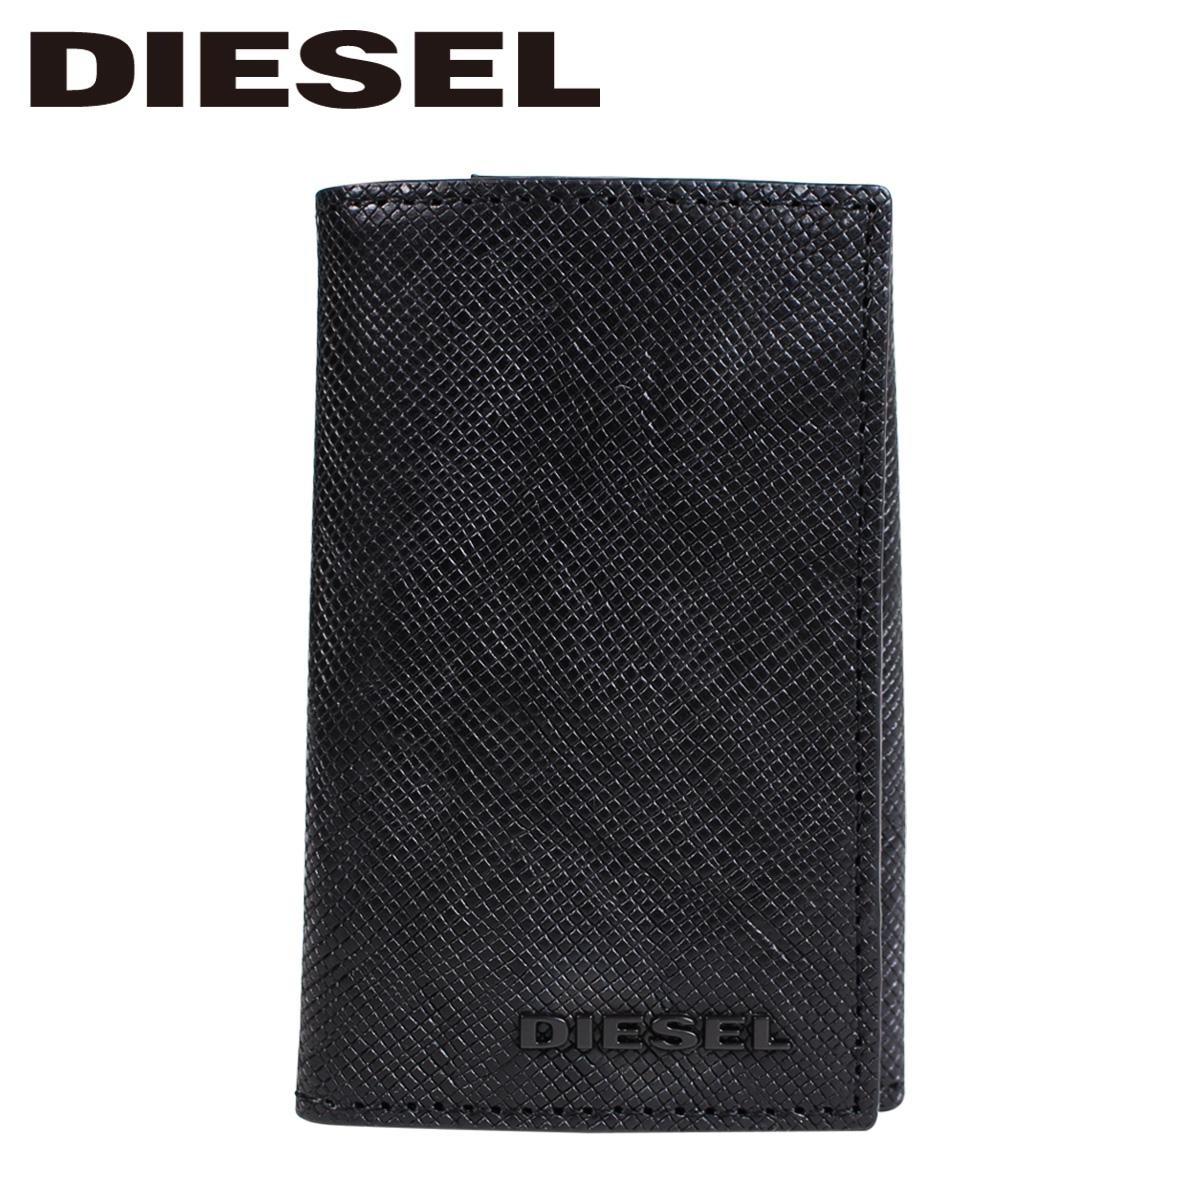 DIESEL SUNBURST KEYCASE O ディーゼル キーケース メンズ 本革 6連 ブラック X05370 P0517